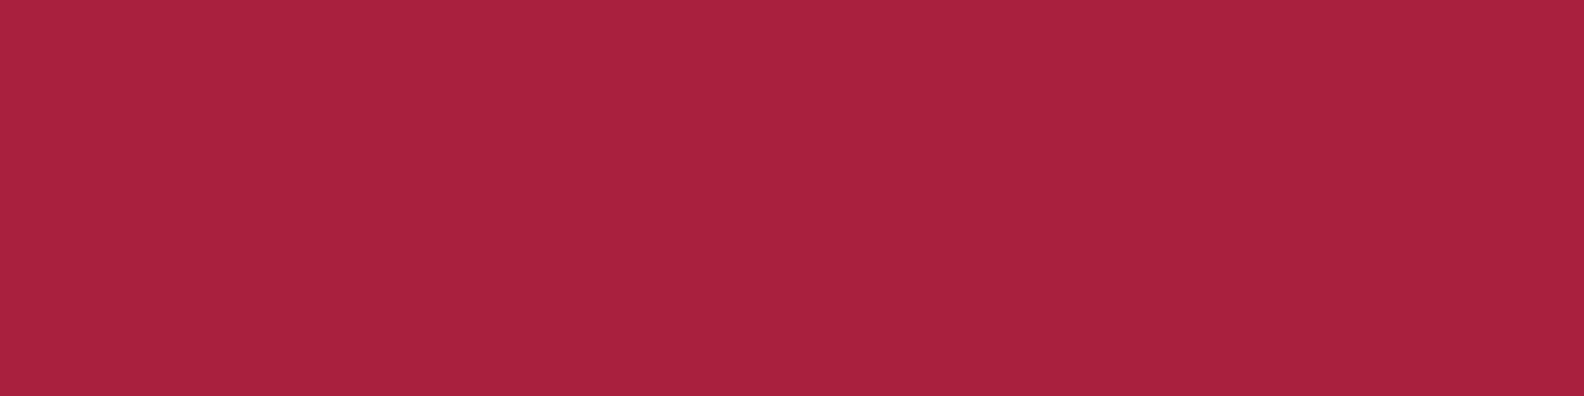 1584x396 Deep Carmine Solid Color Background